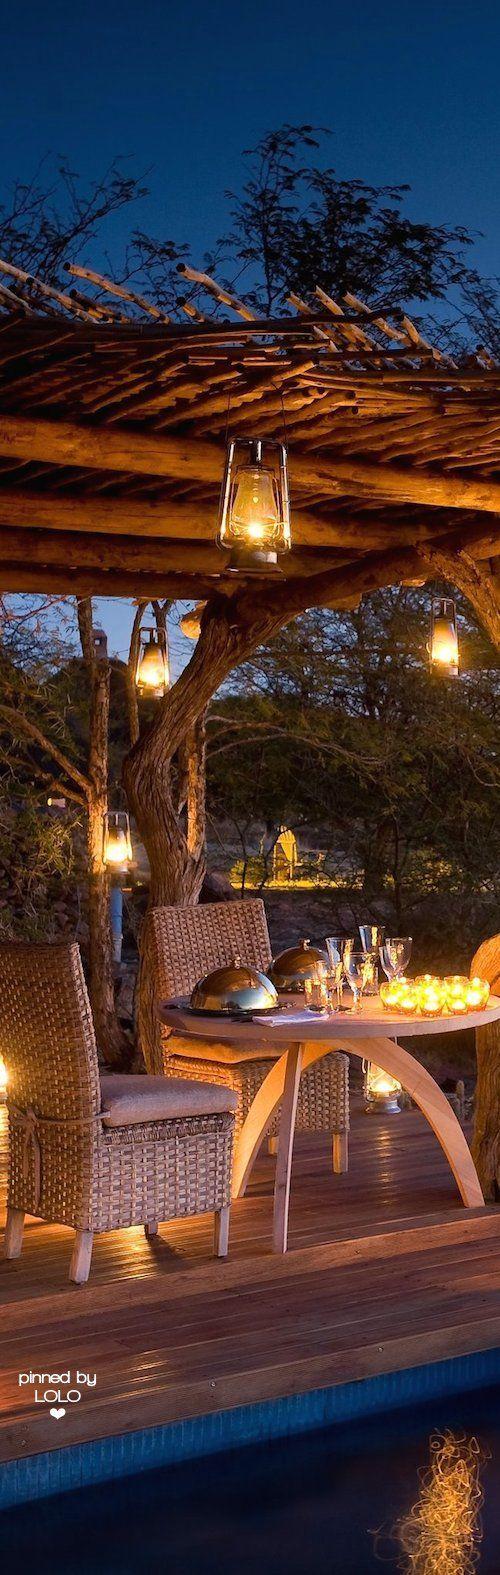 Tswalu Kalahari South Africa Private Game Reserve | LOLO❤